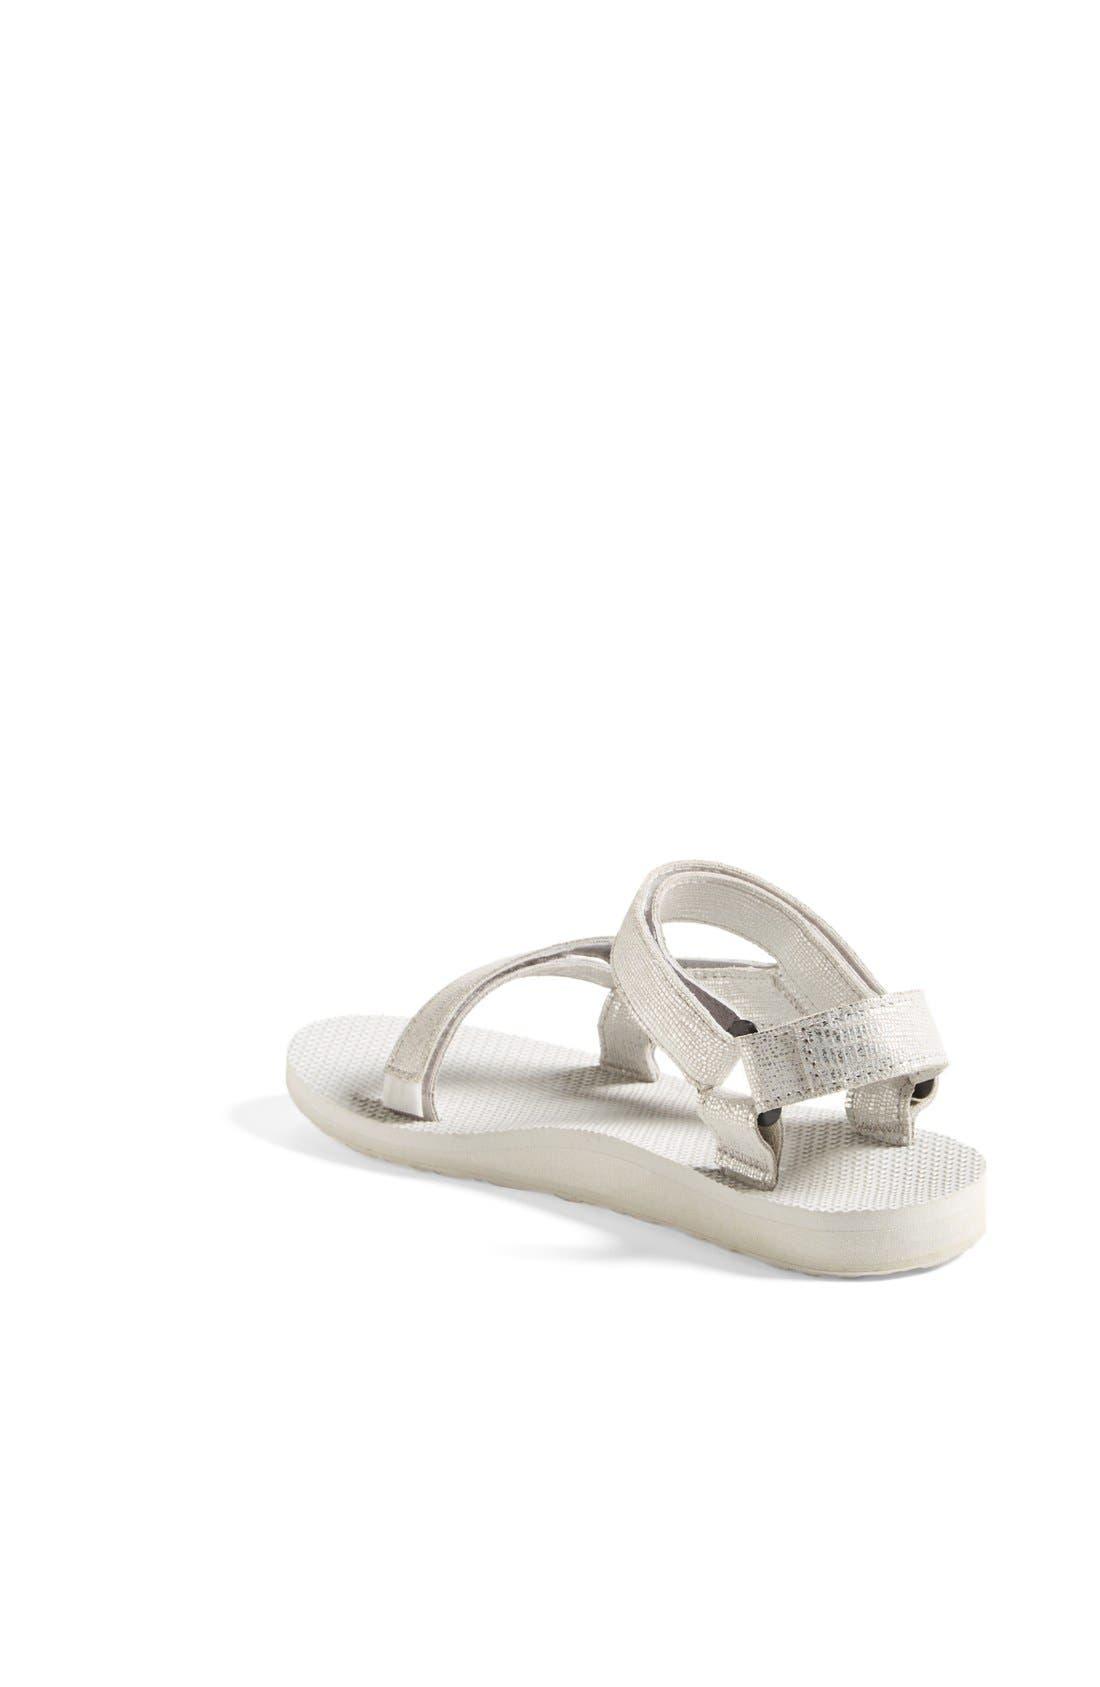 Alternate Image 2  - Teva 'Original Universal' Sandal (Nordstrom Exclusive) (Women)